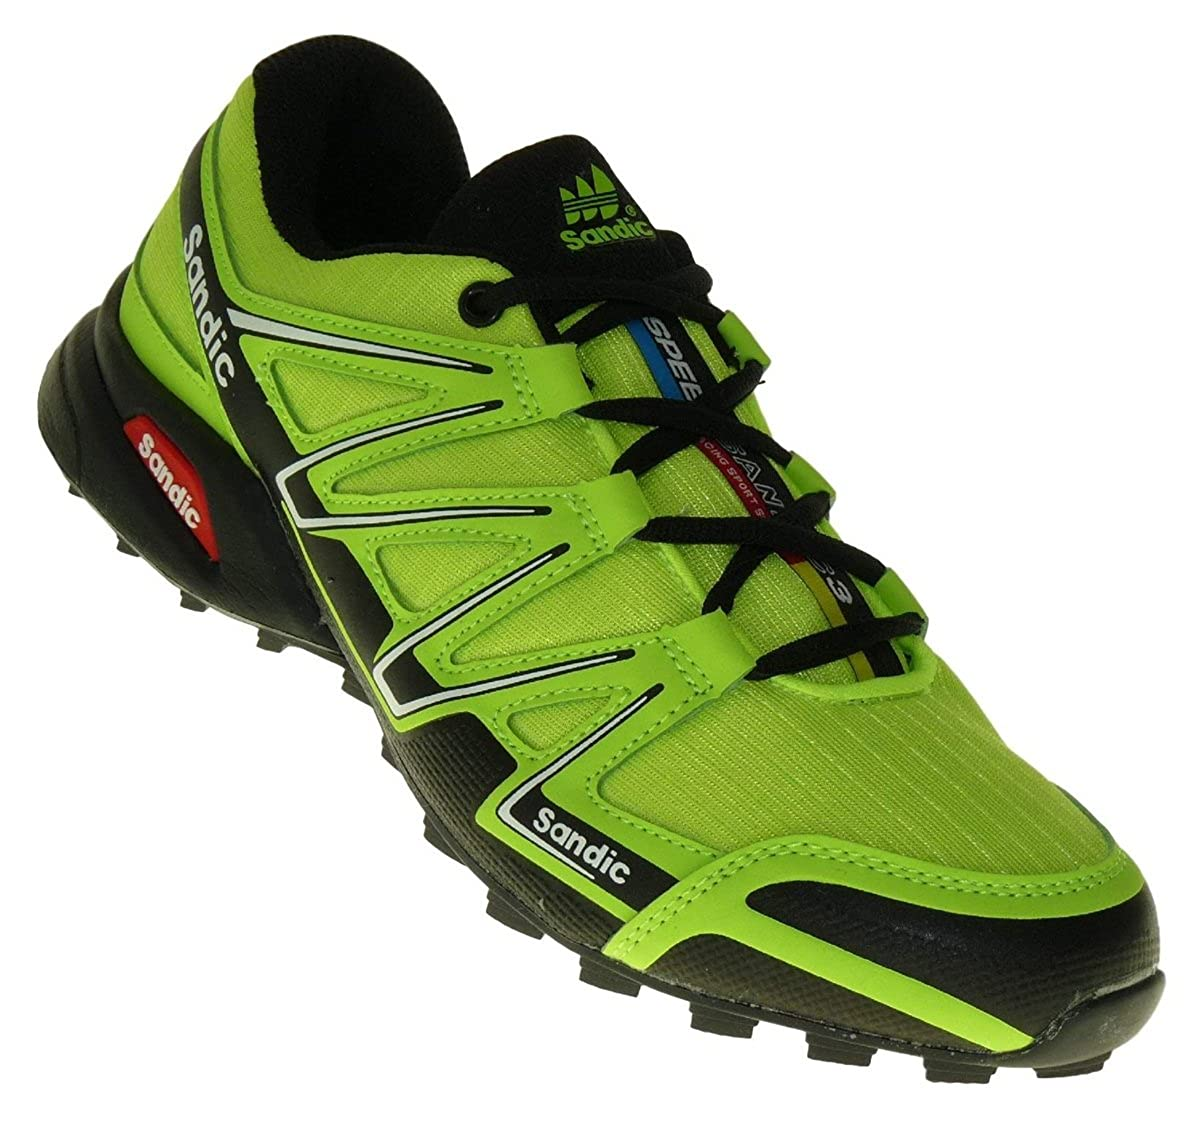 Bootsland 713 Neon Turnschuhe Sneaker Sportschuhe Herren